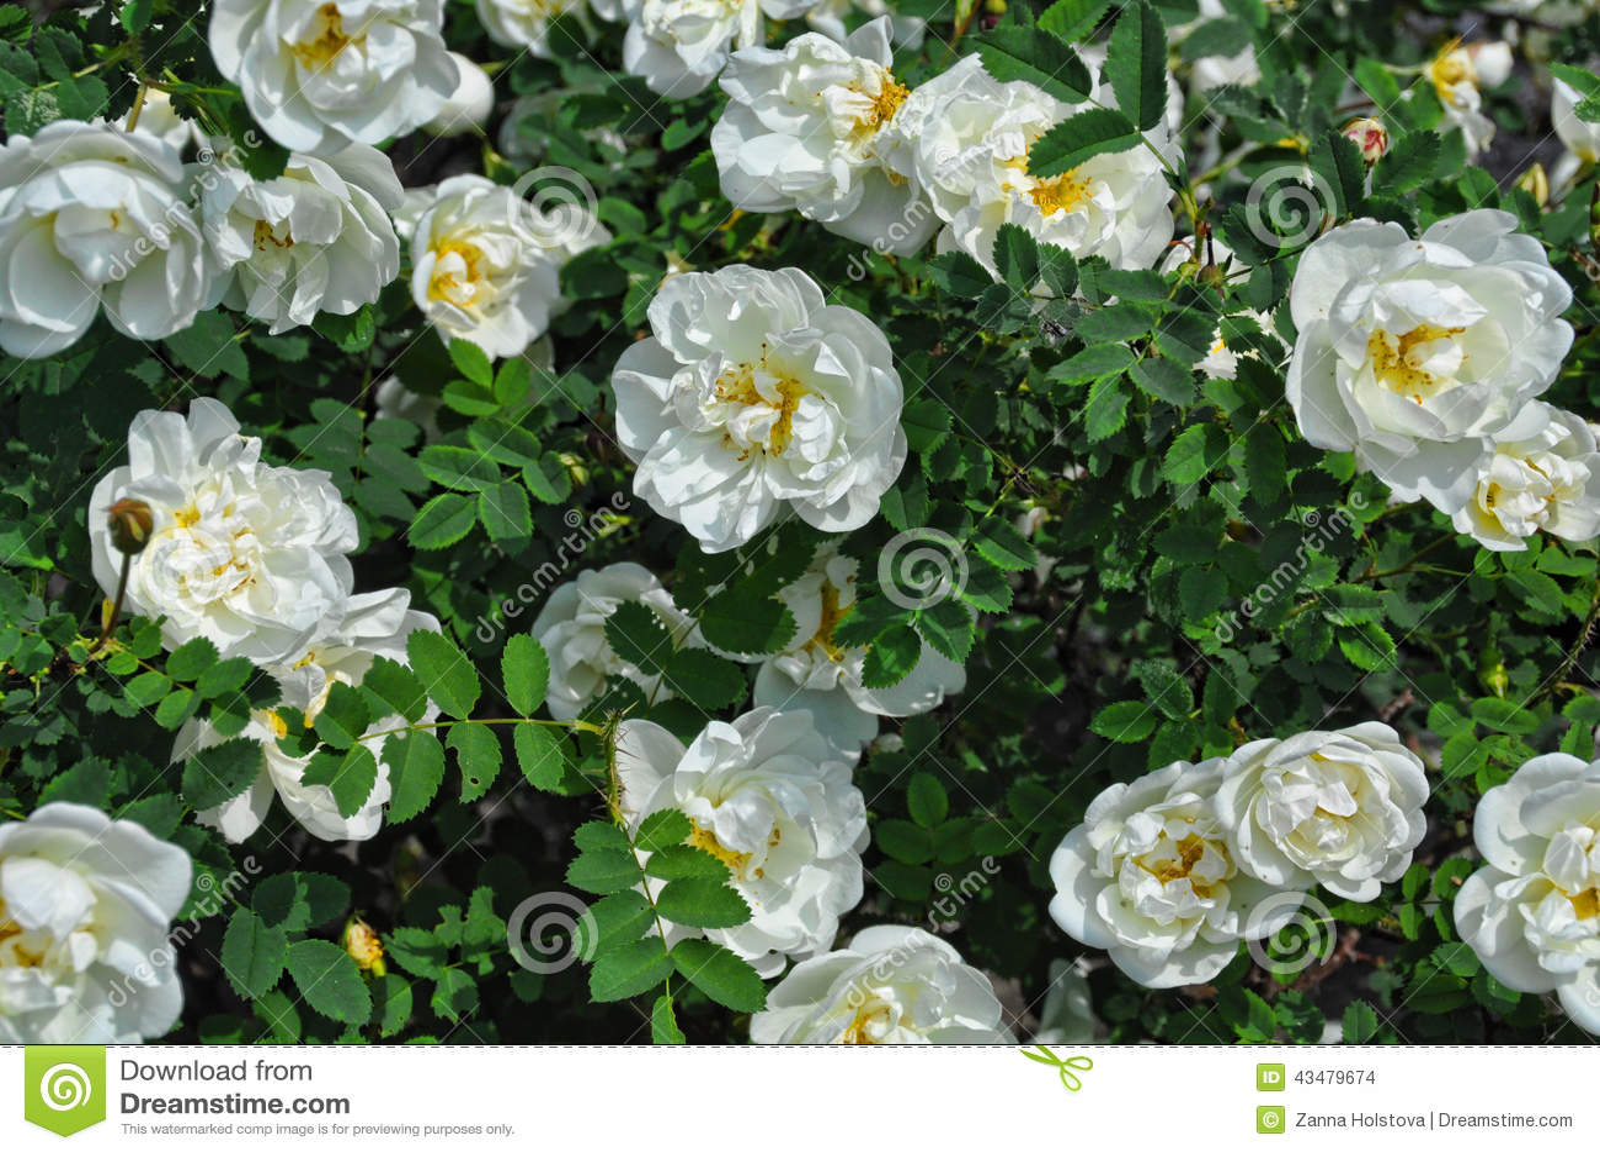 White Garden Rose Bush white wild rose bush stock photo - image: 43479674